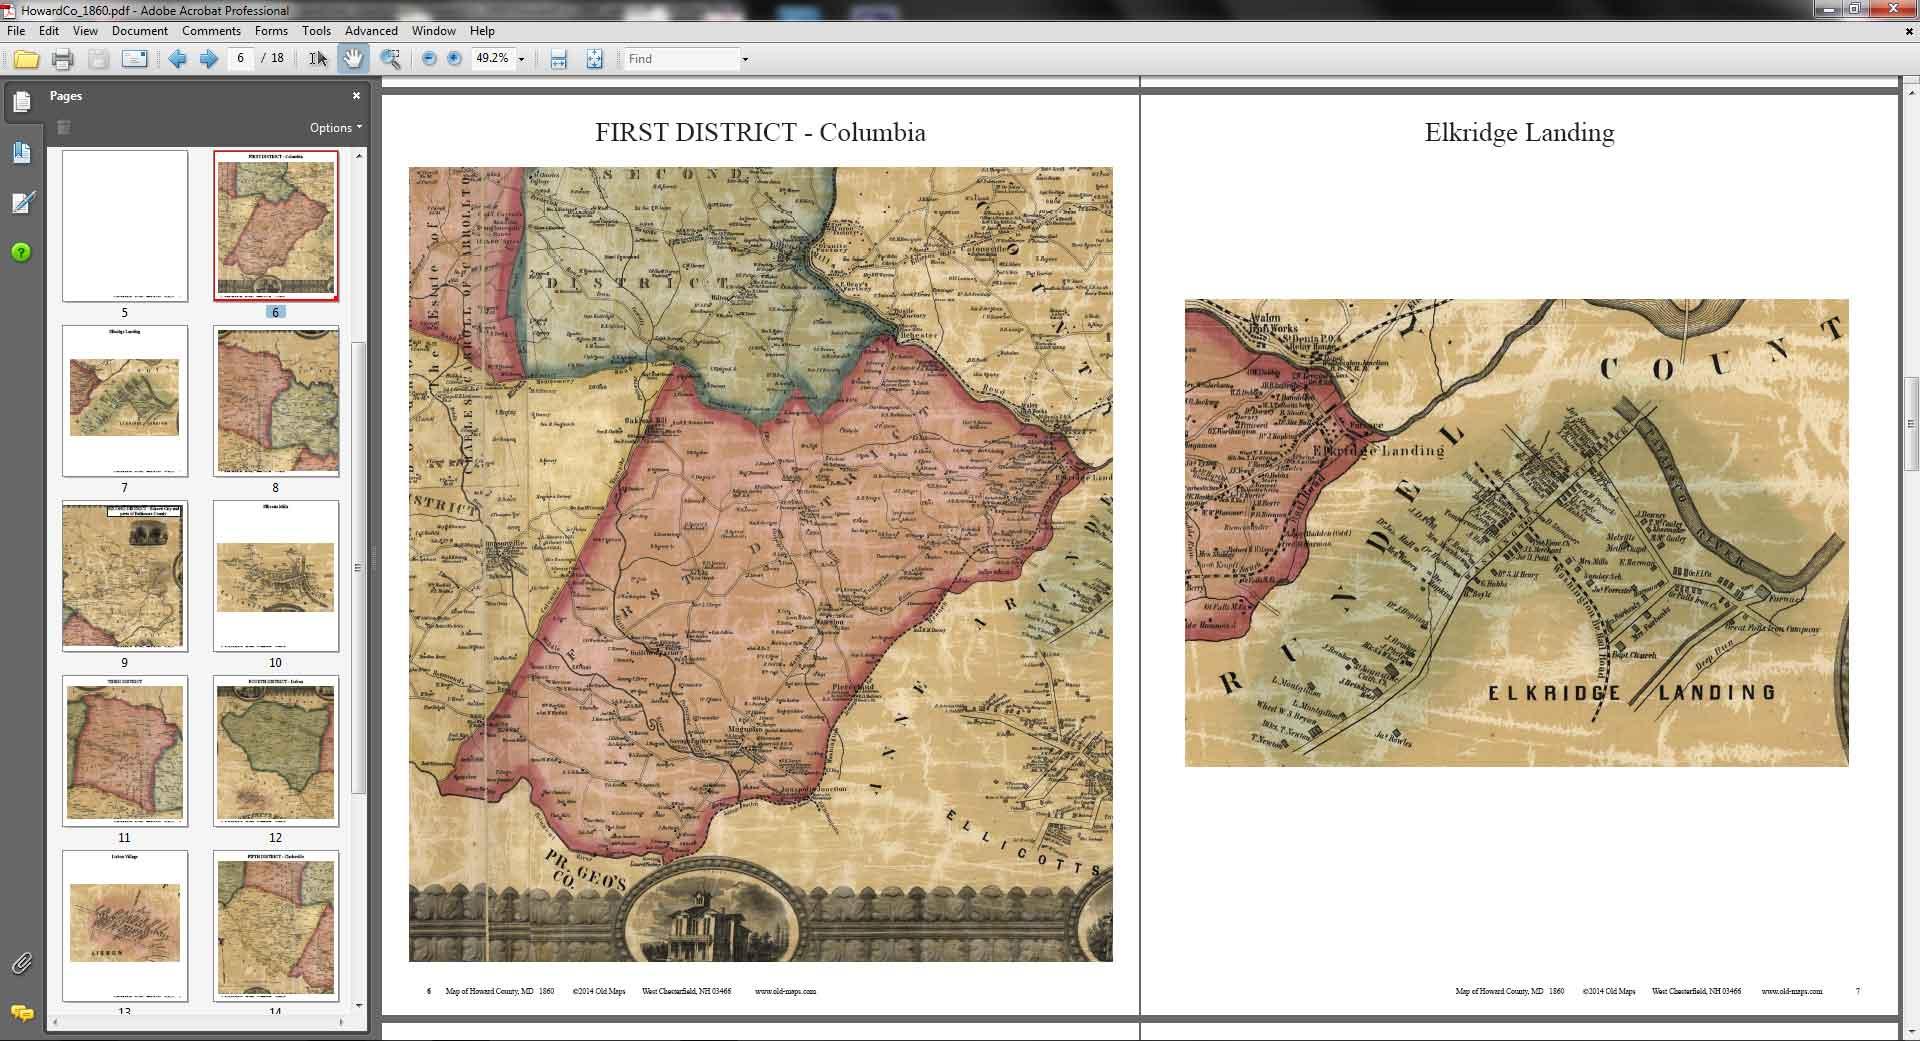 Howard County Maryland 1860 - CDROM details